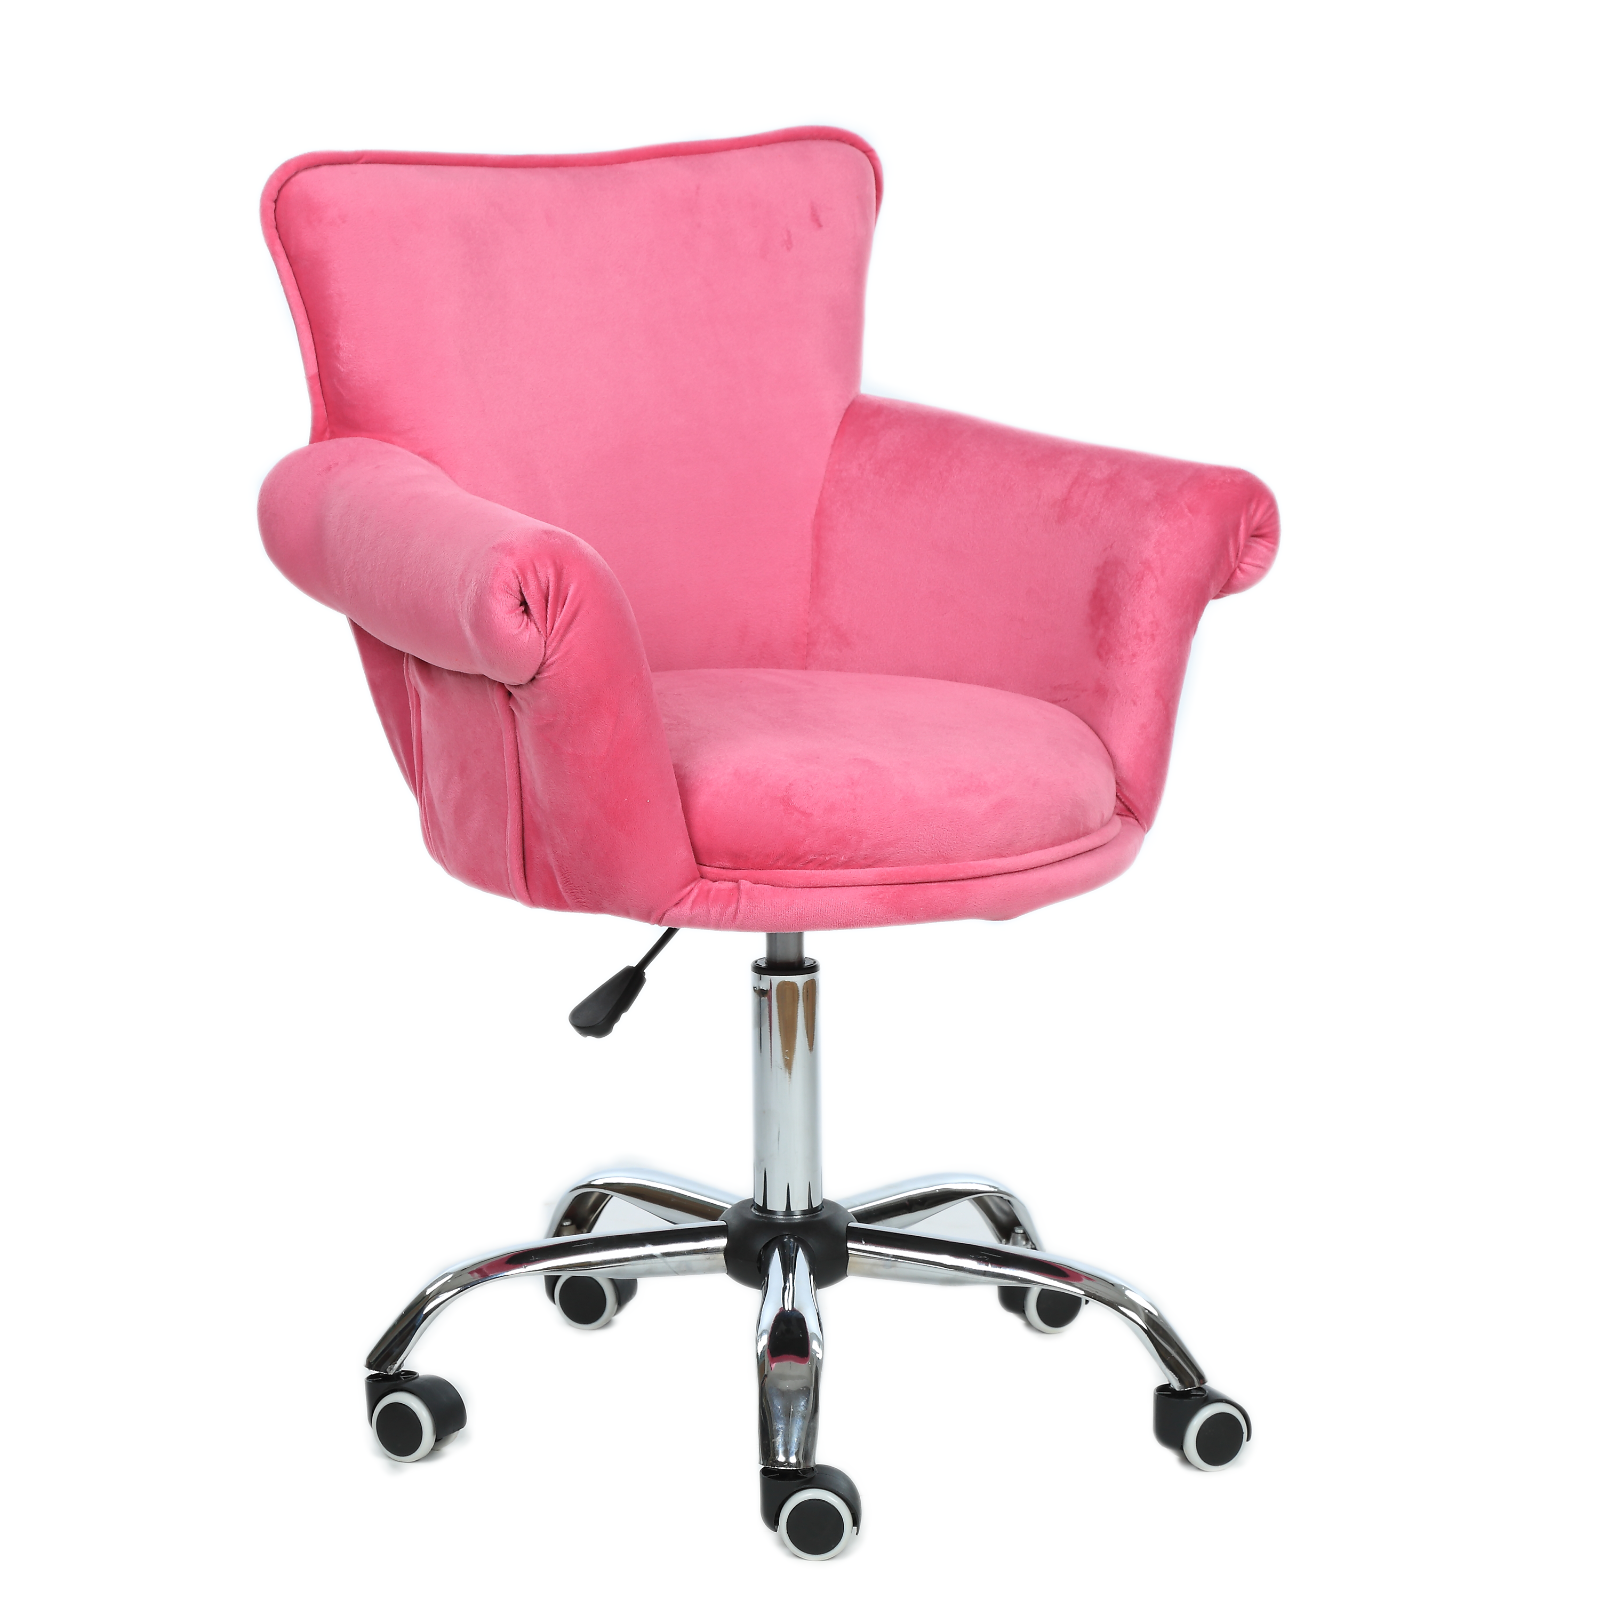 Microfiber Beauty Nail Salon Chair Bar stool Spa Vanity Seat